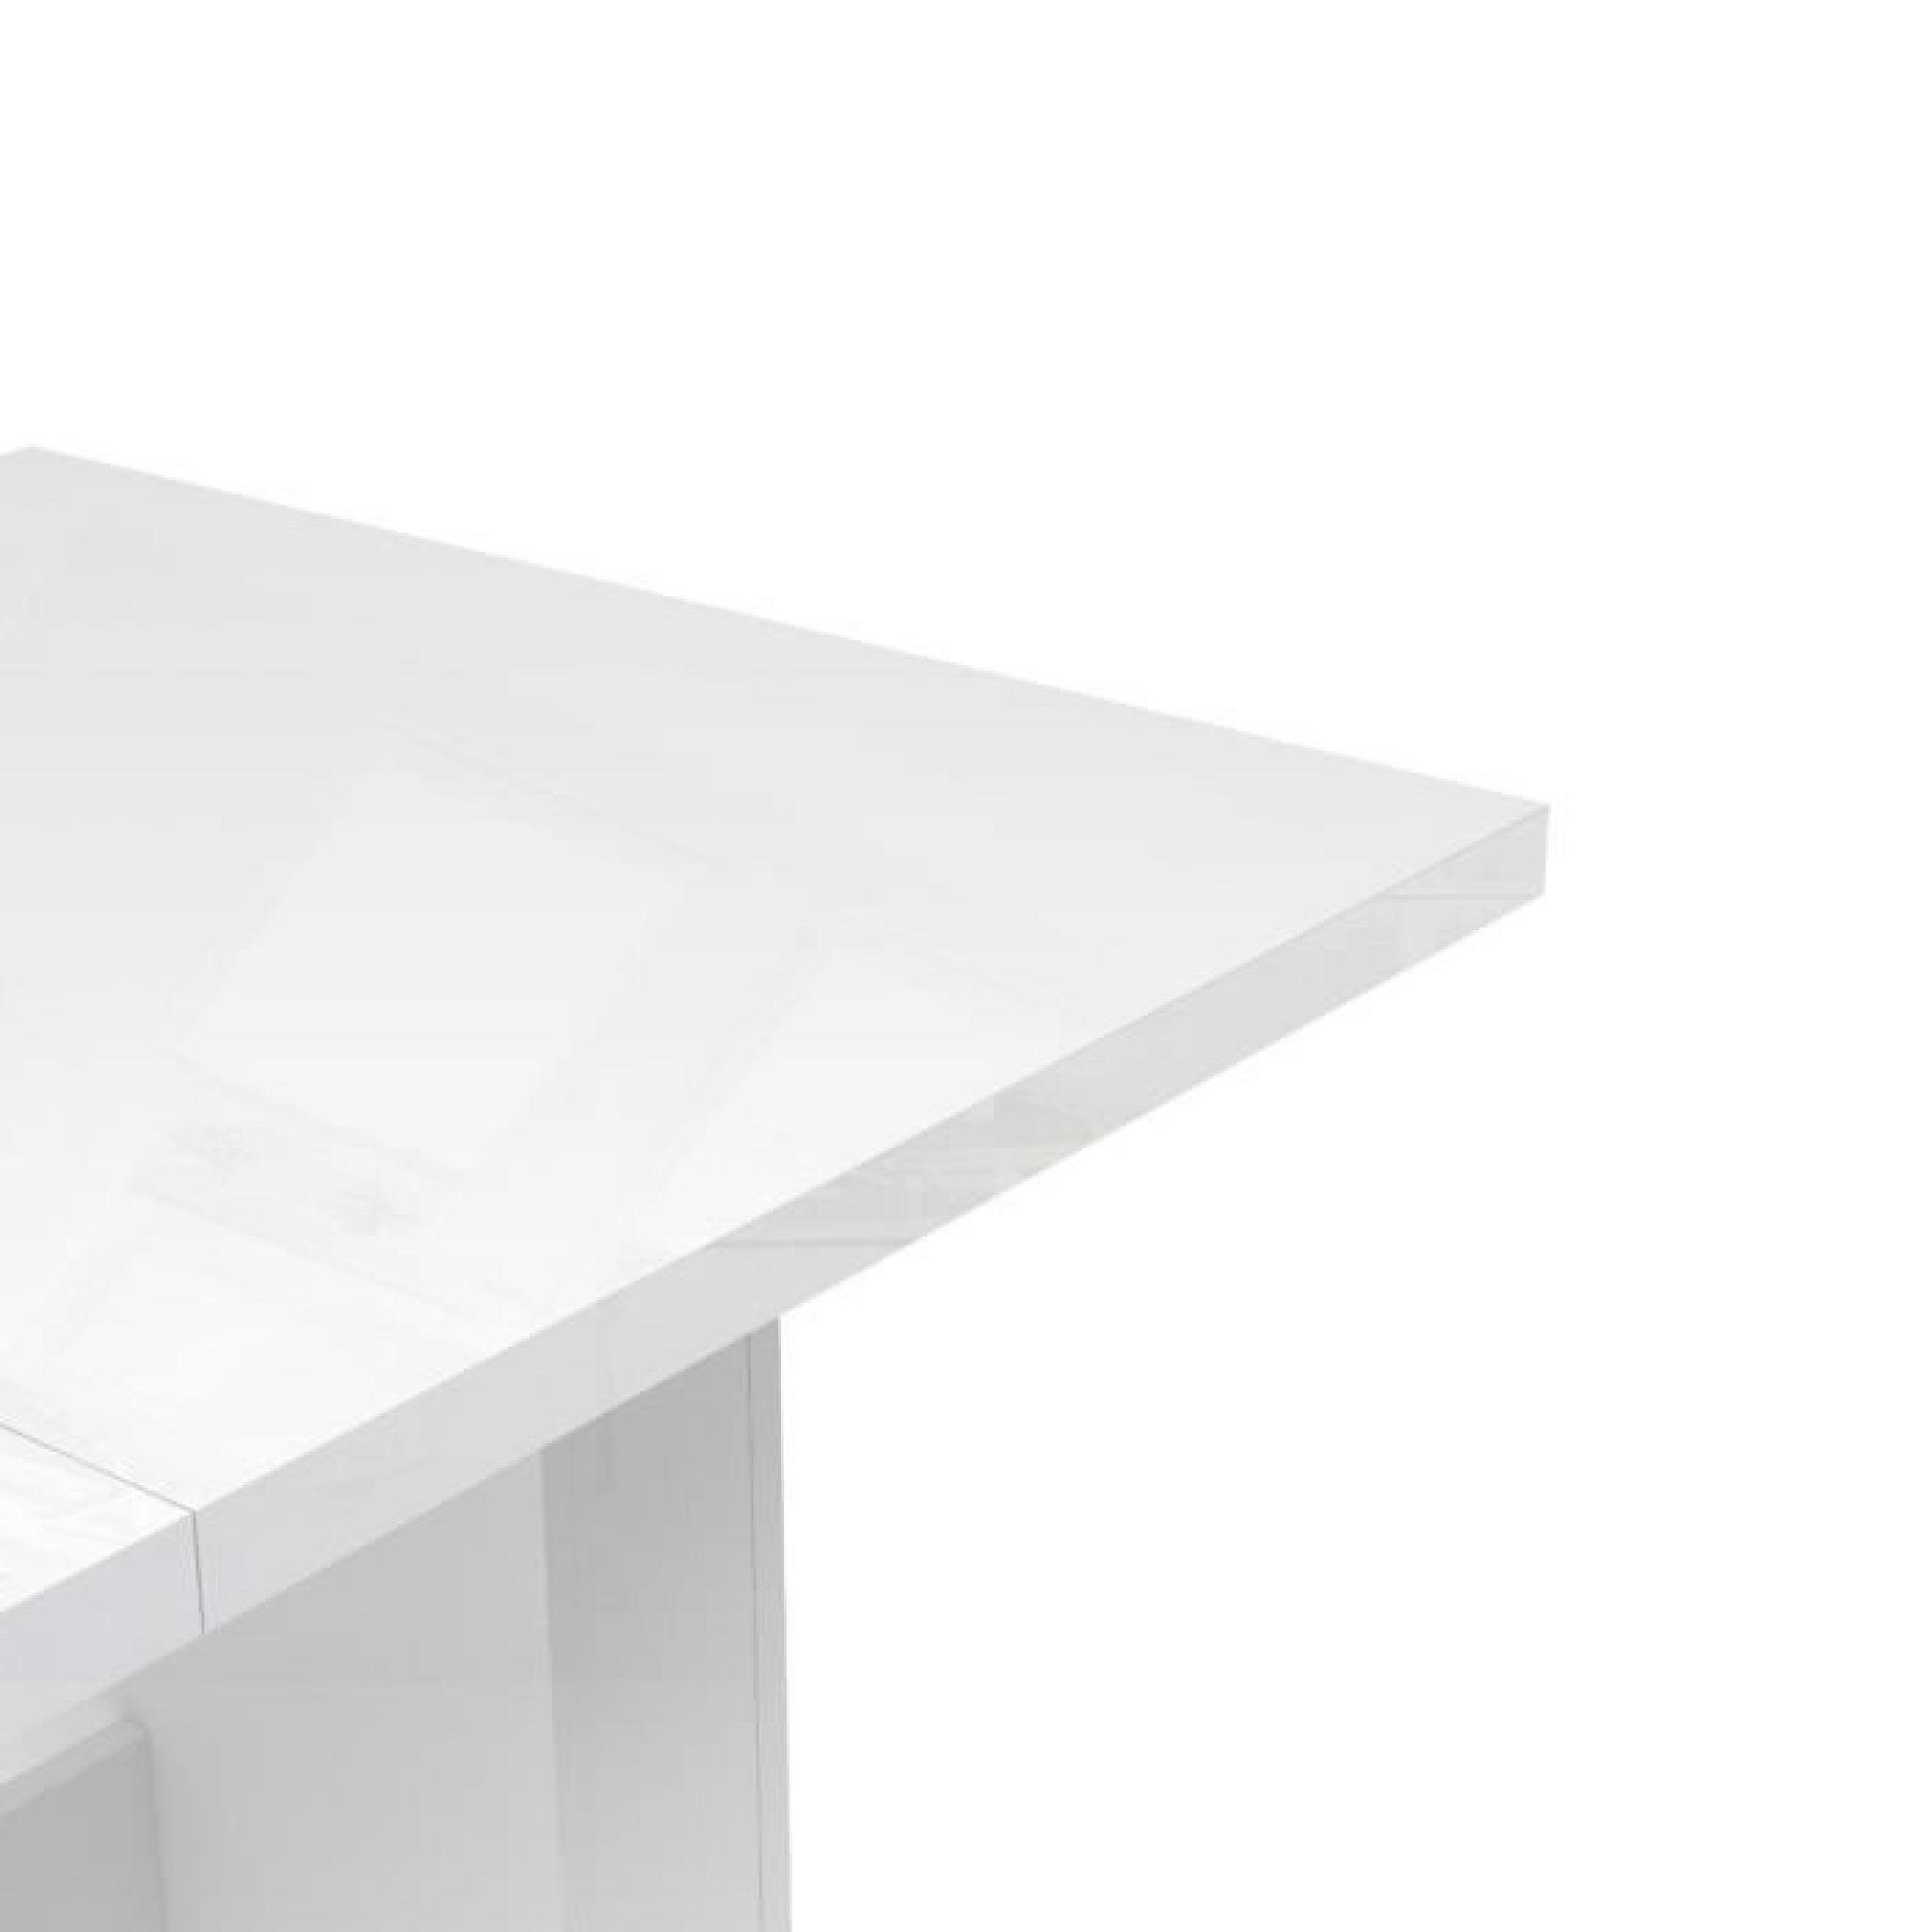 FINLANDEK Table à manger extensible KOVA 140 273x75cm blanc brillant Achat Vente table salle a